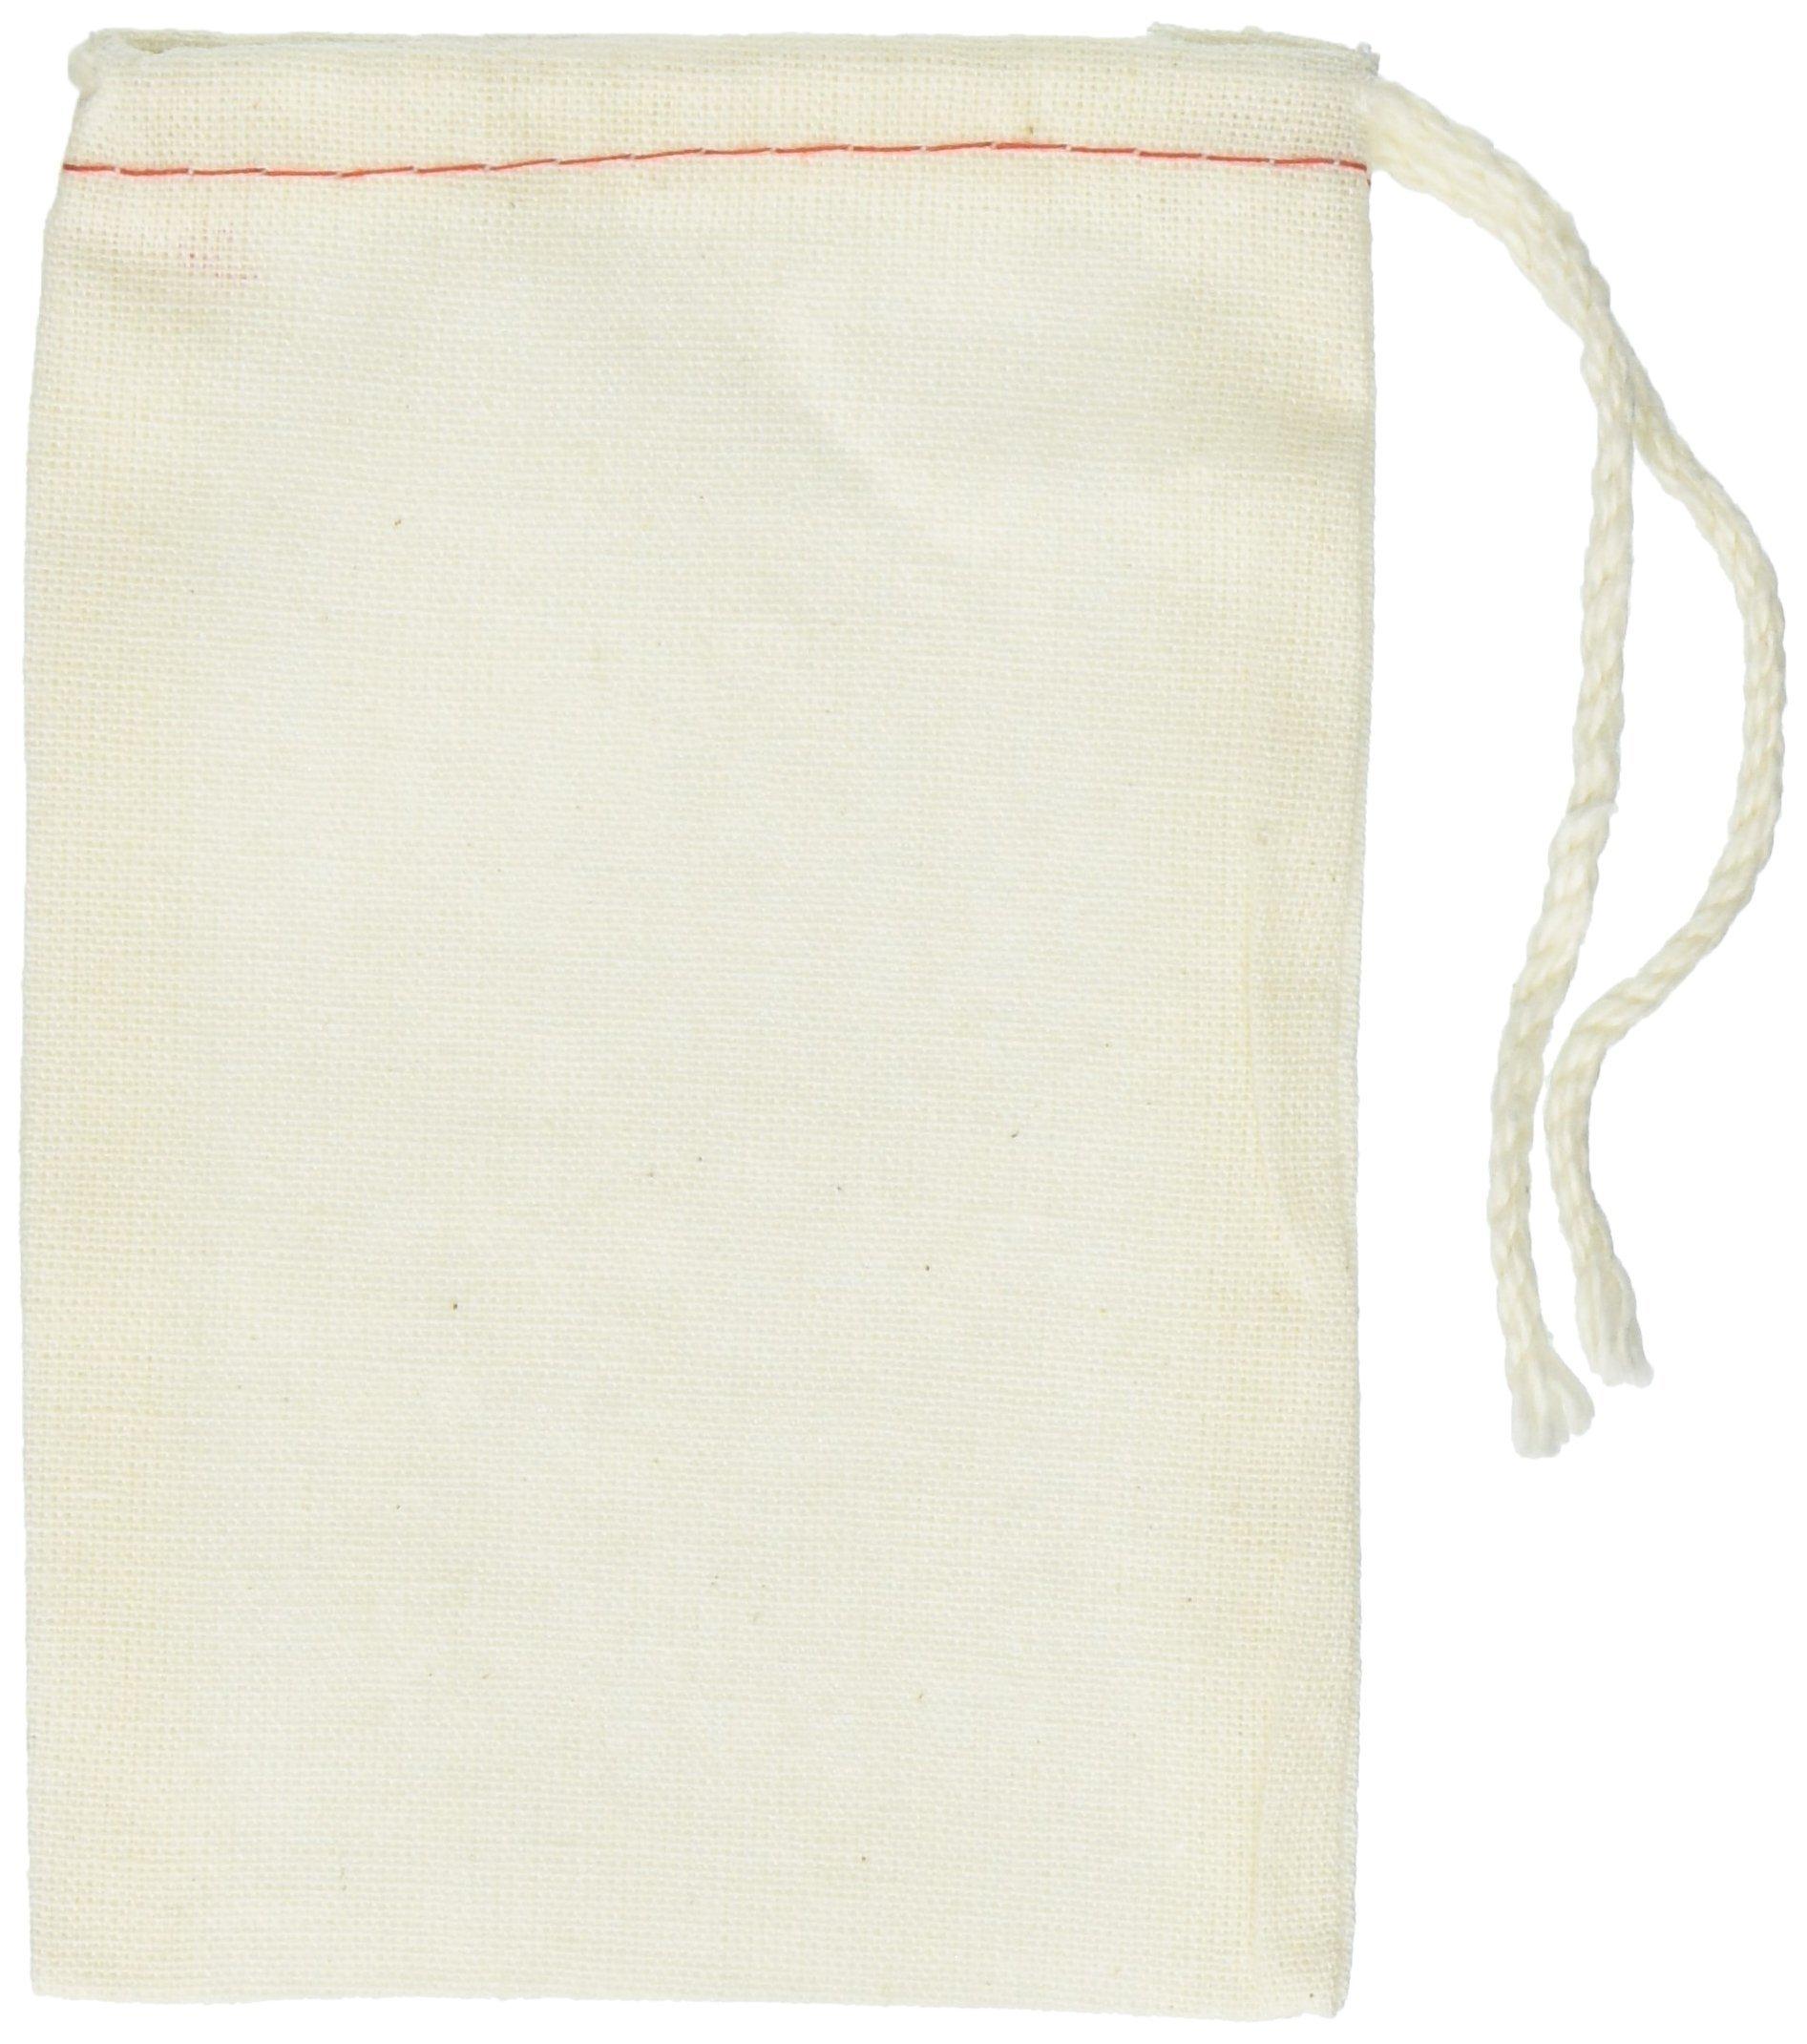 Cotton Drawstring Muslin Bags, 3'' X 5'' - Pack of 25